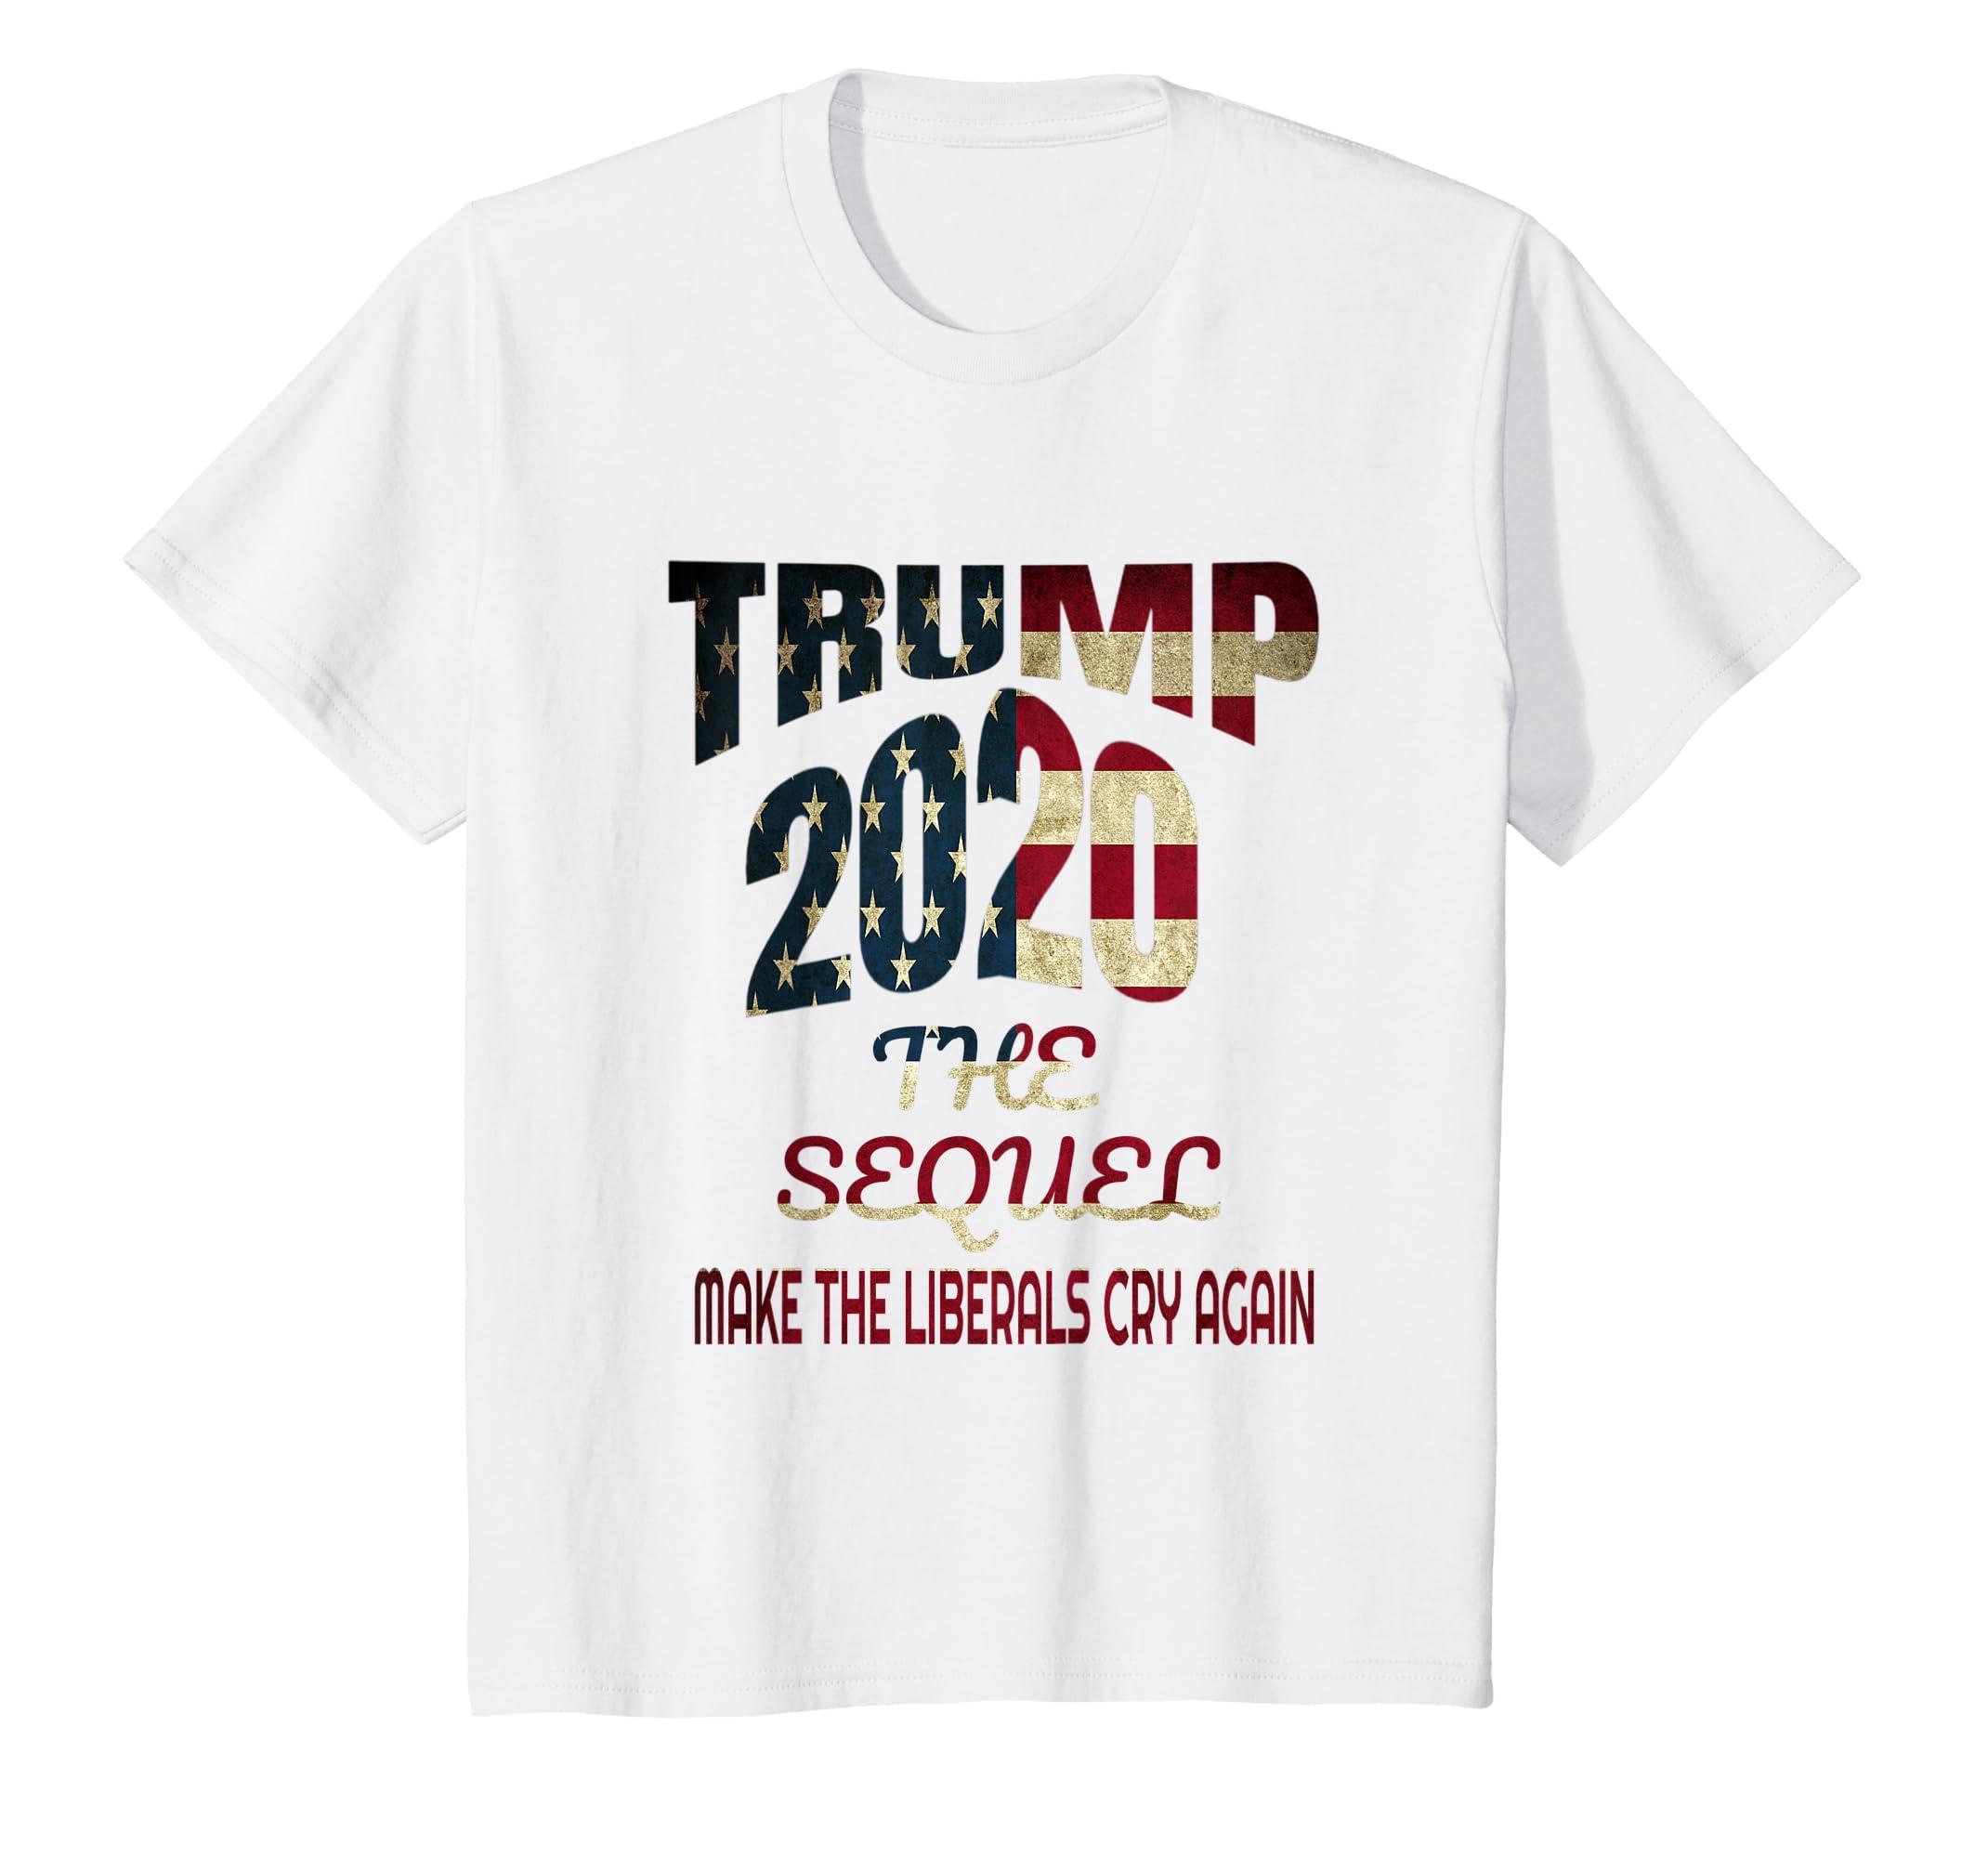 f36e5f52 Amazon.com: Trump 2020 The Sequel Make Liberals Cry Again T shirt: Clothing